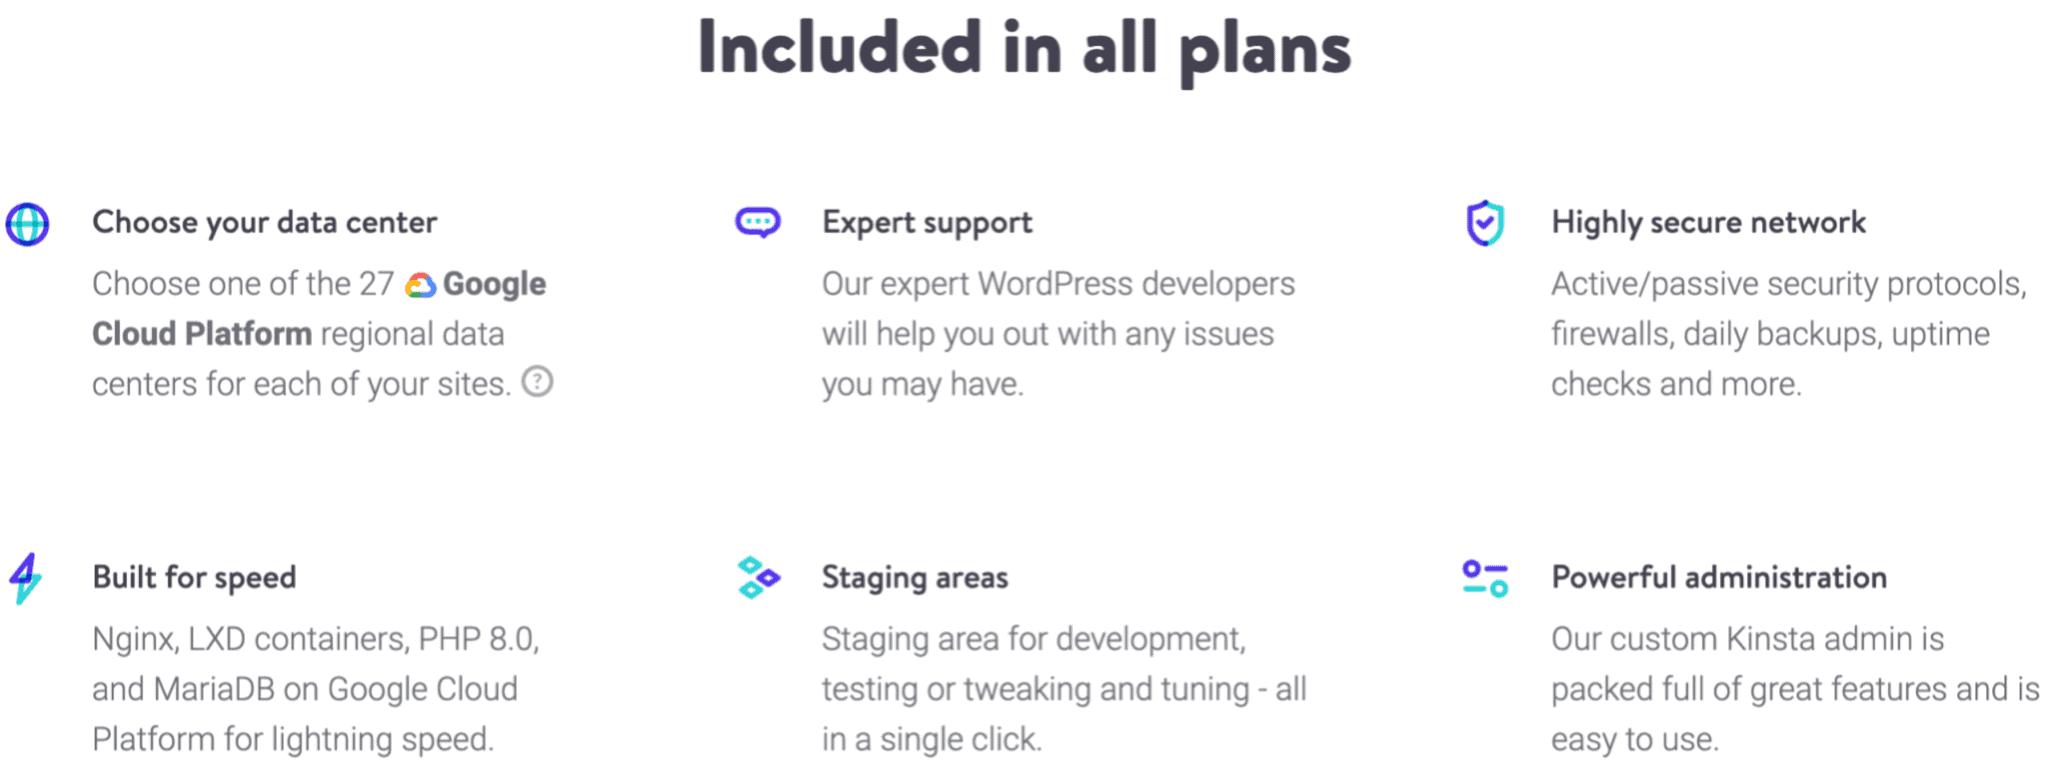 kinst-wordpress-hosting-features